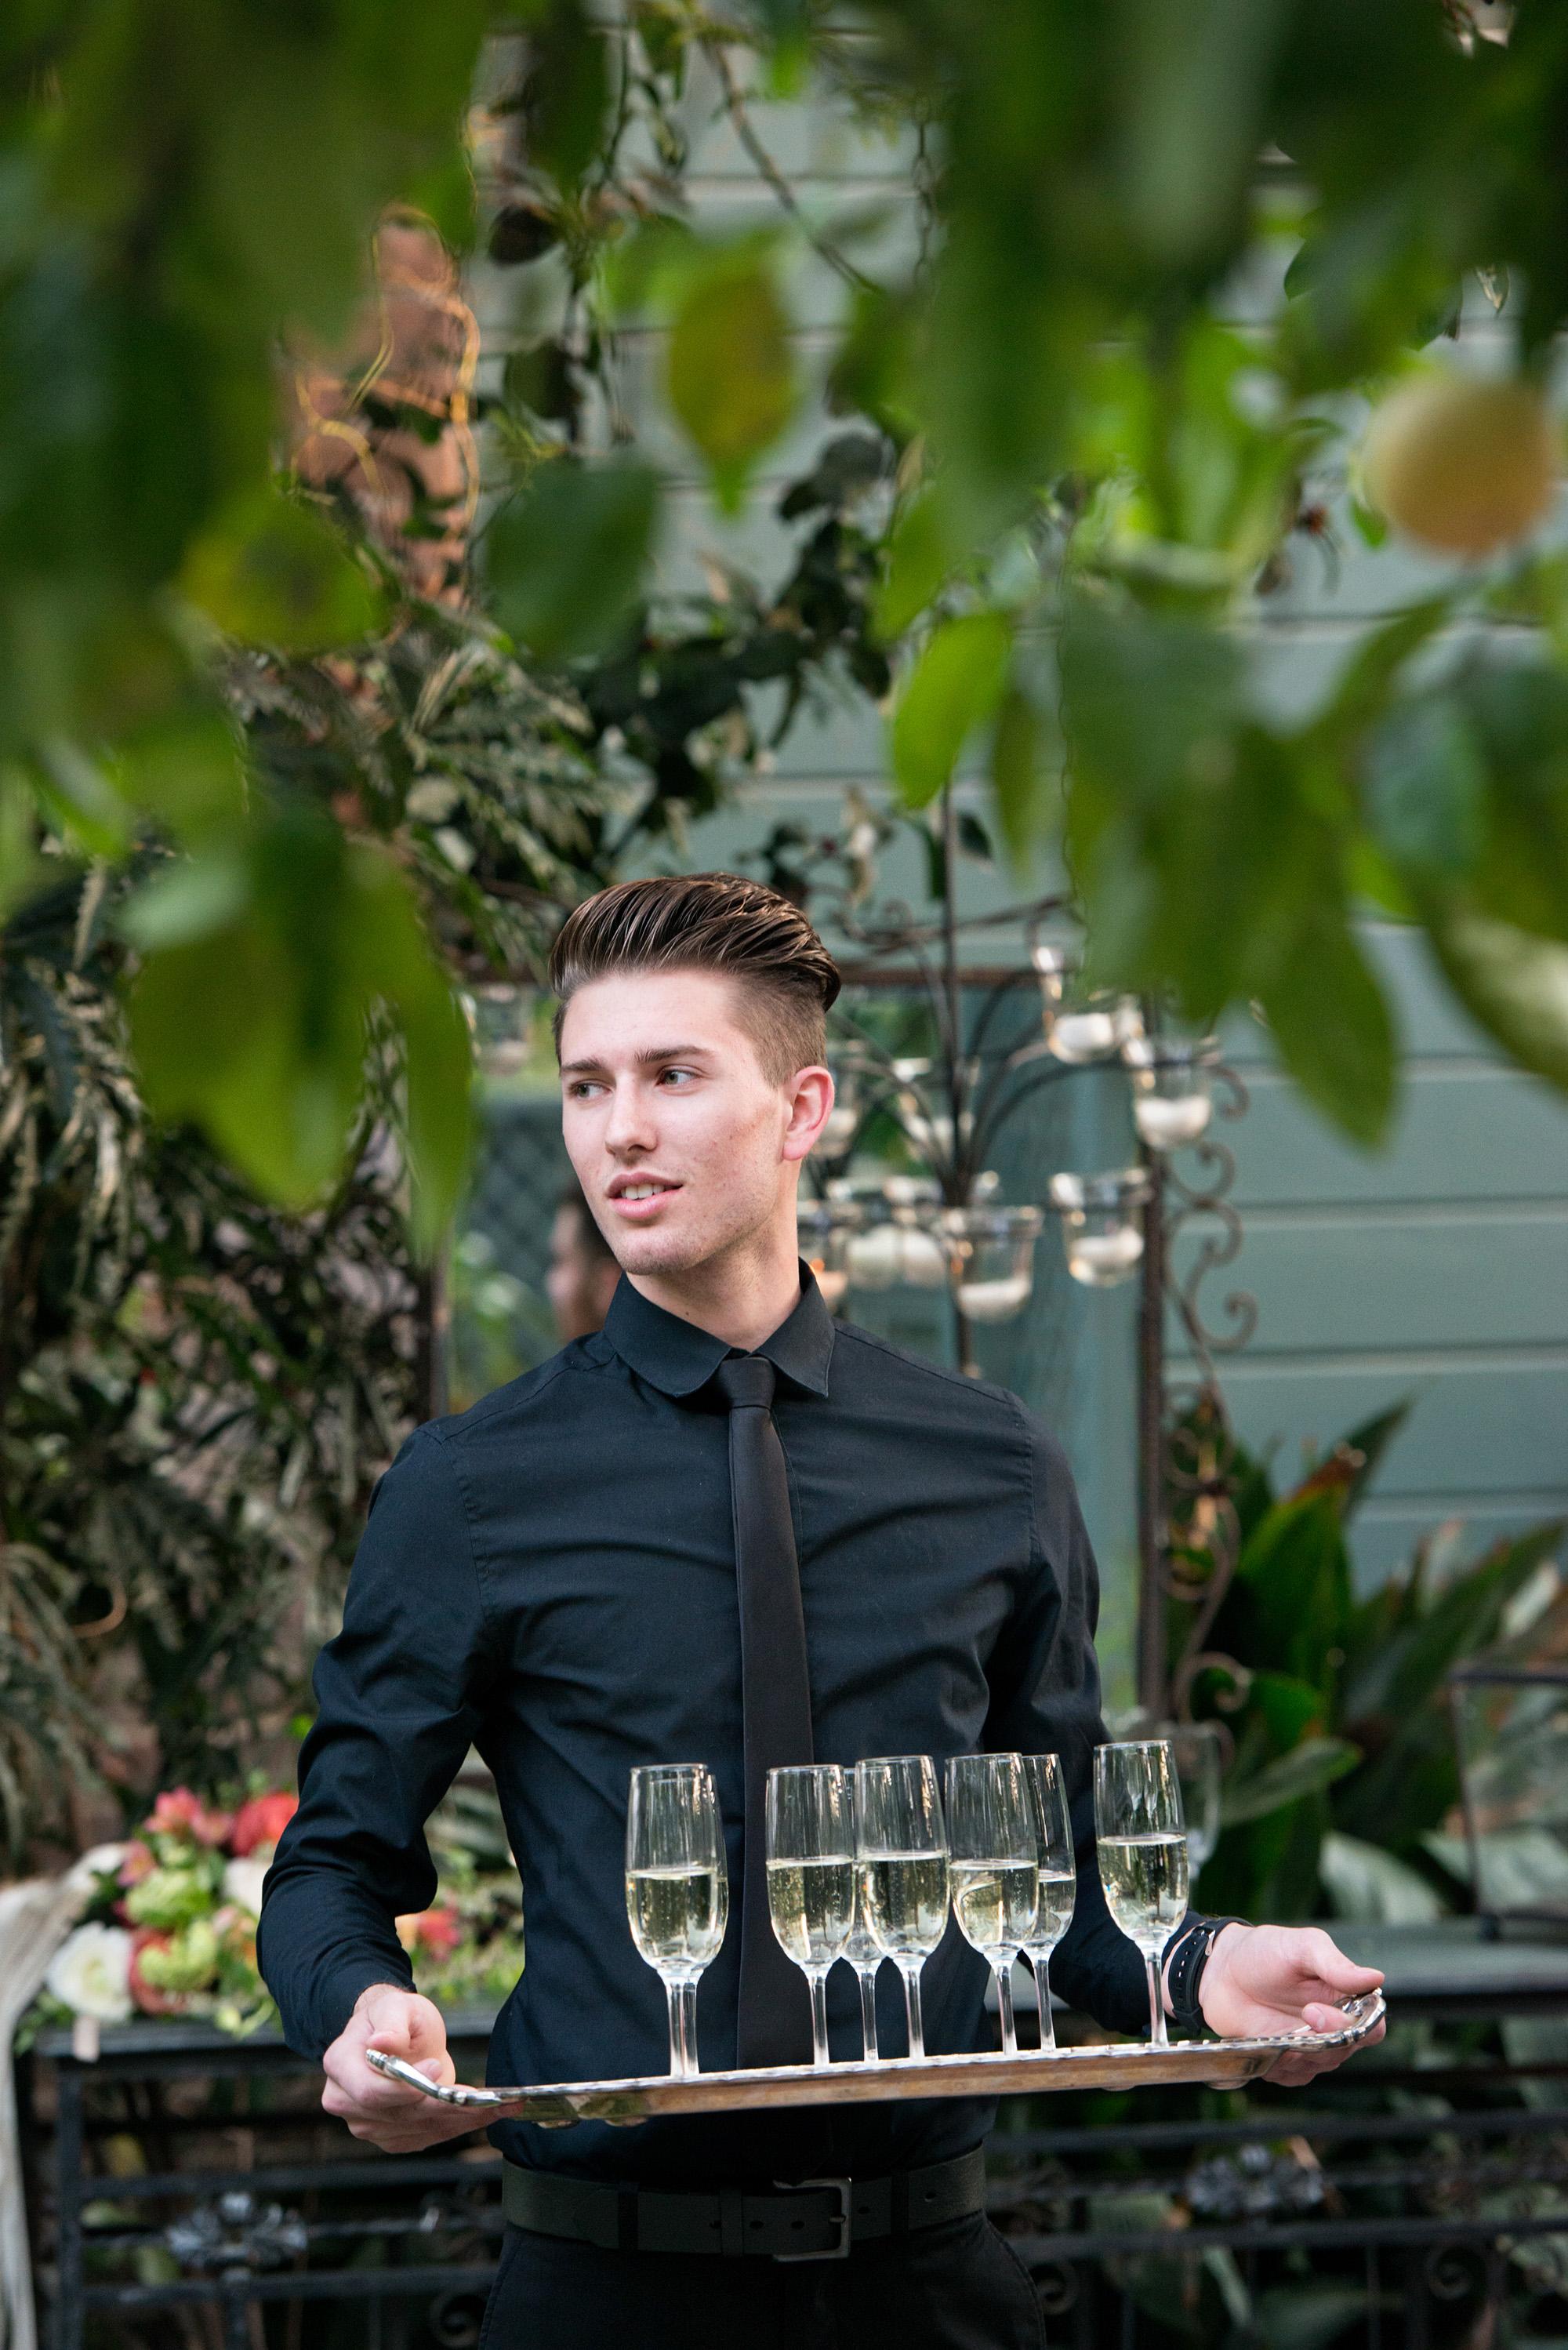 christmas-house-weddings-receptions-carrie-vines-067.jpg